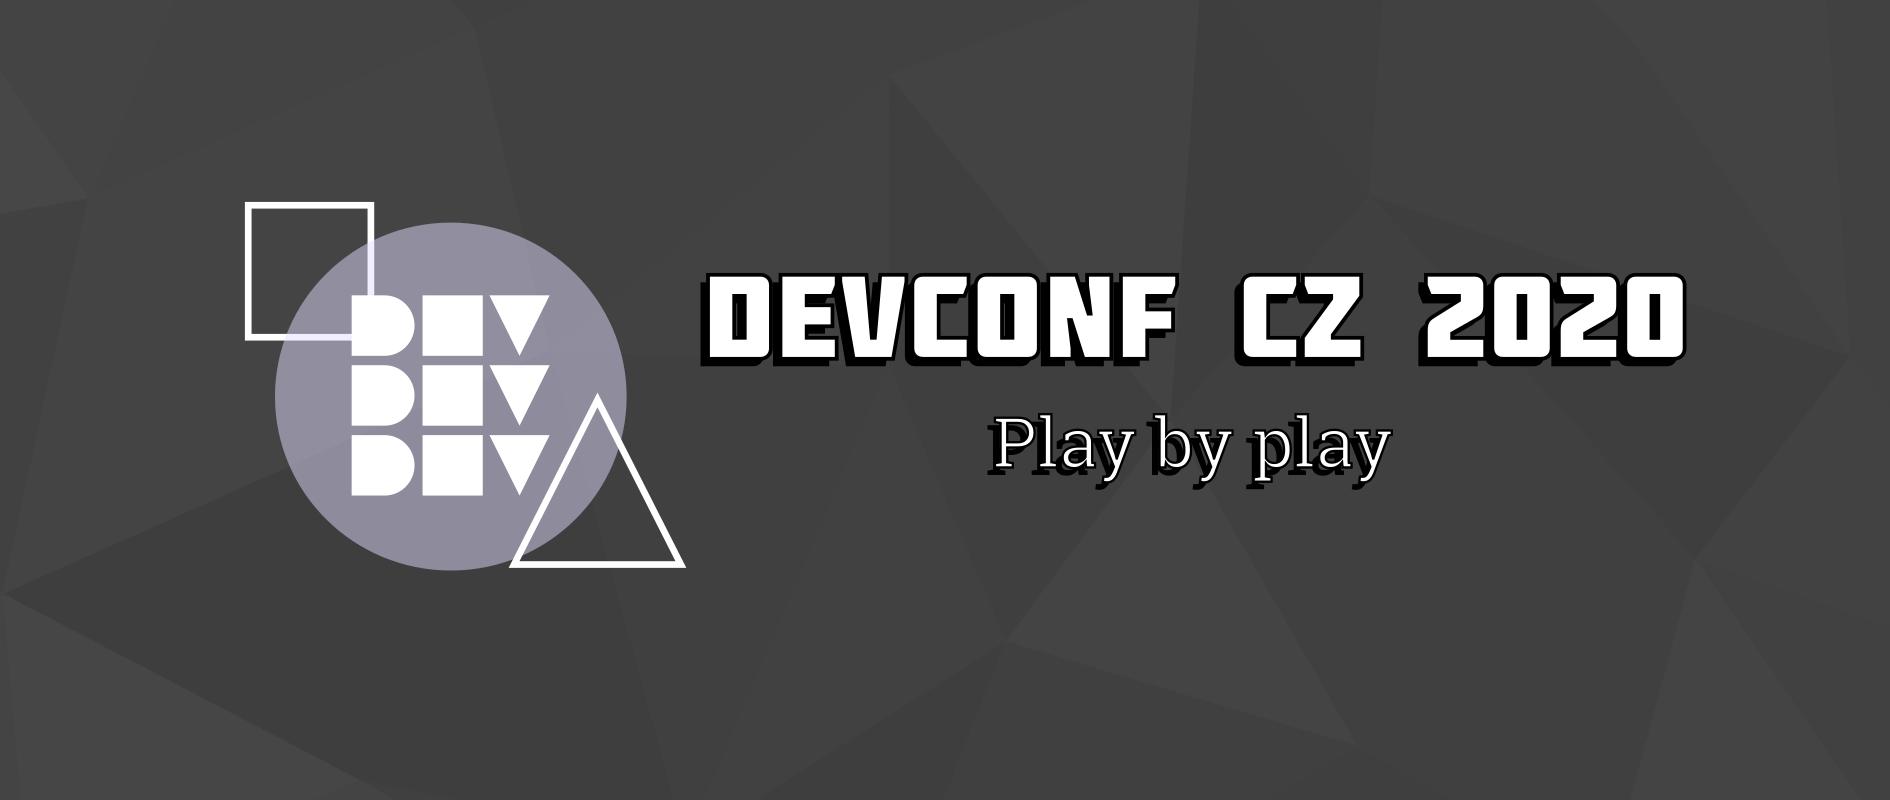 DevConf CZ 2020: play by play - RapidAPI